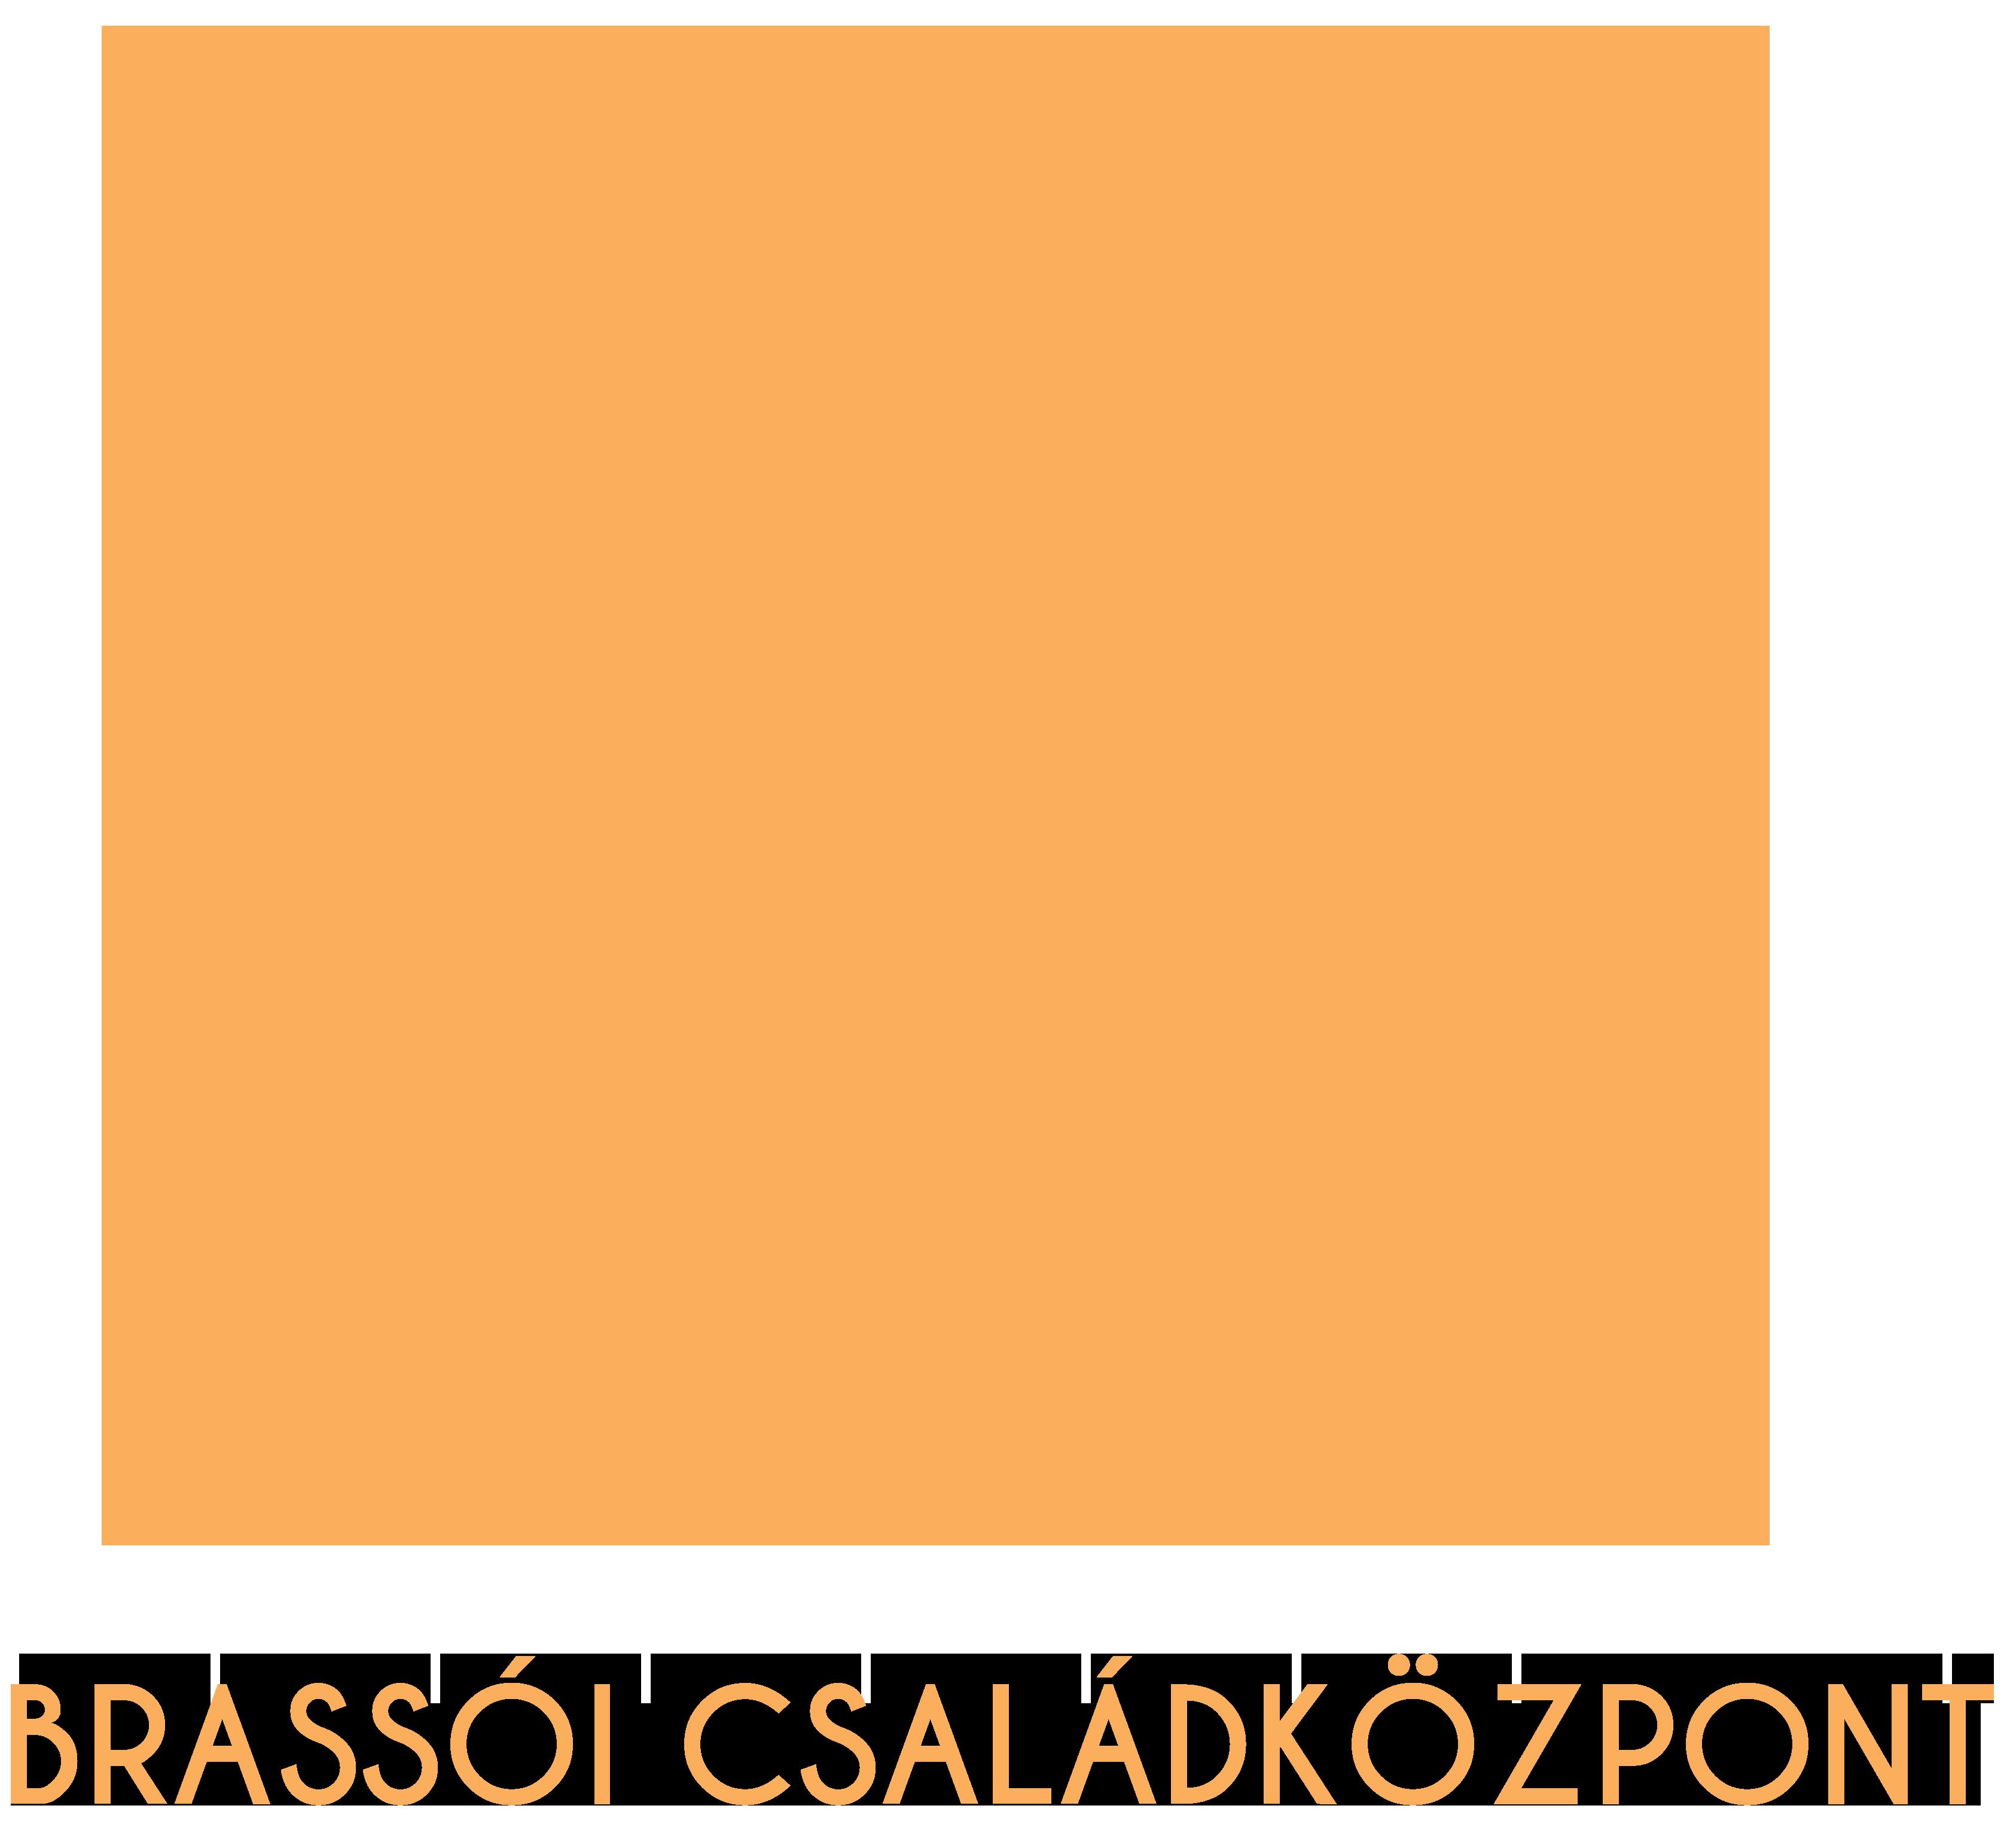 Asociația de Tineri din Ardeal Filiala Brasov logo